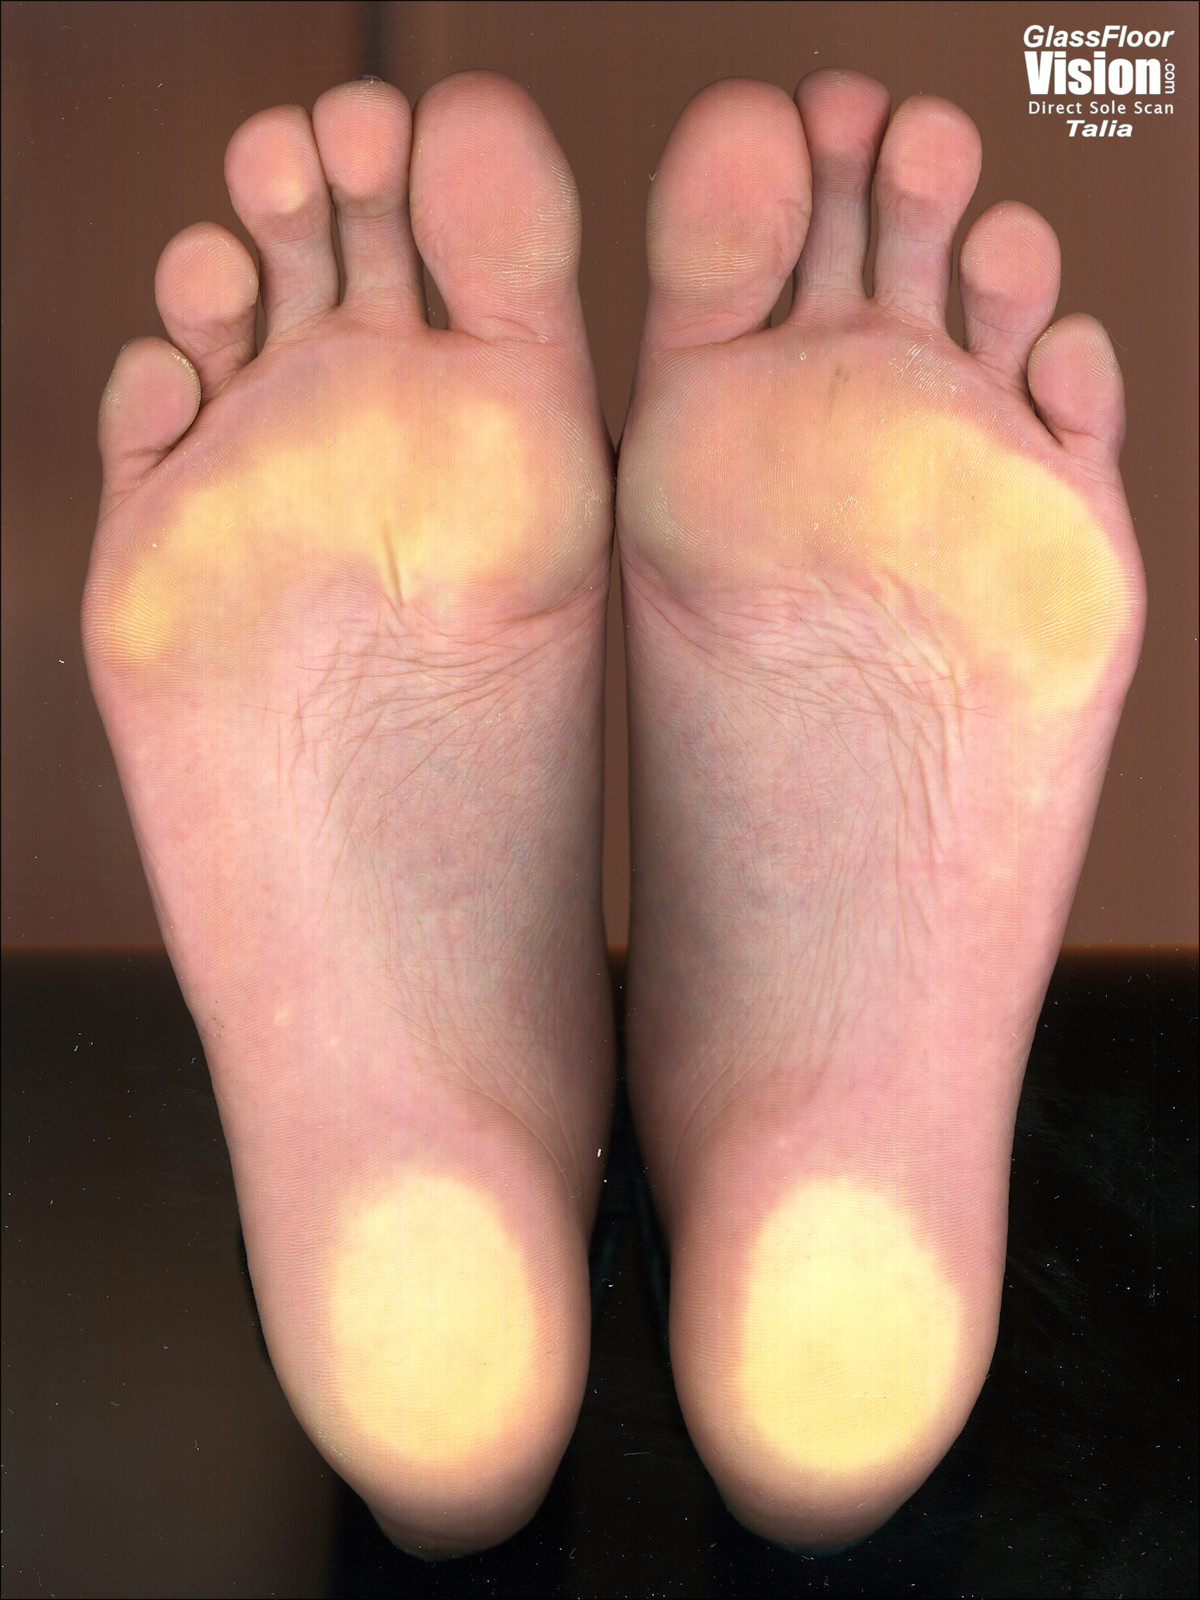 a girl named Talia showing her feet